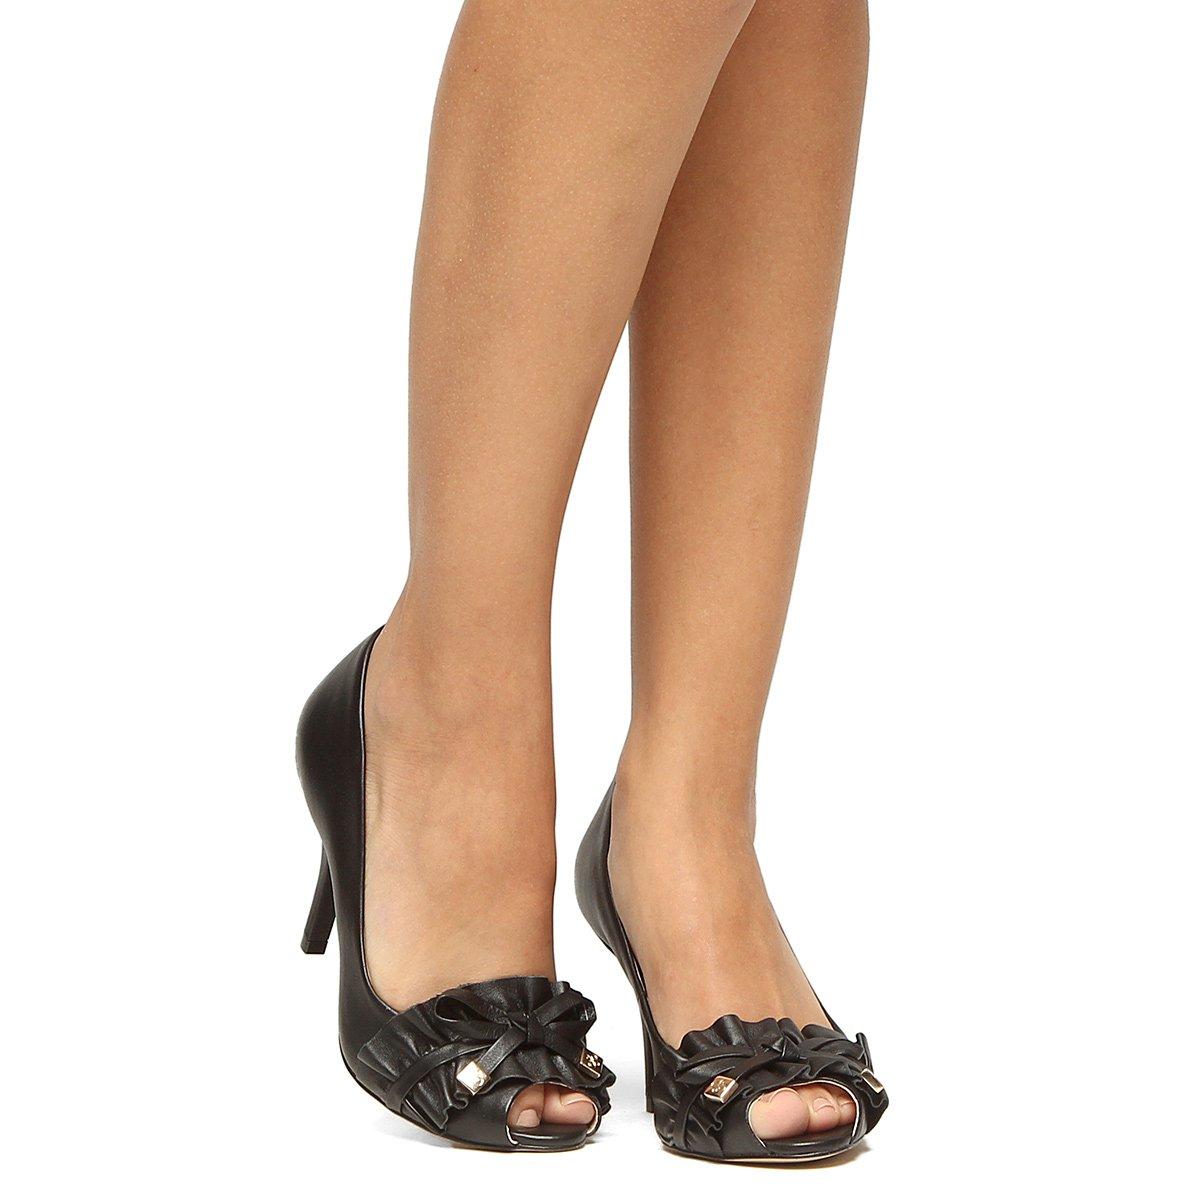 Preto Toe Peep Toe Babado Shoestock Salto Peep Couro Fino n8xwxCf